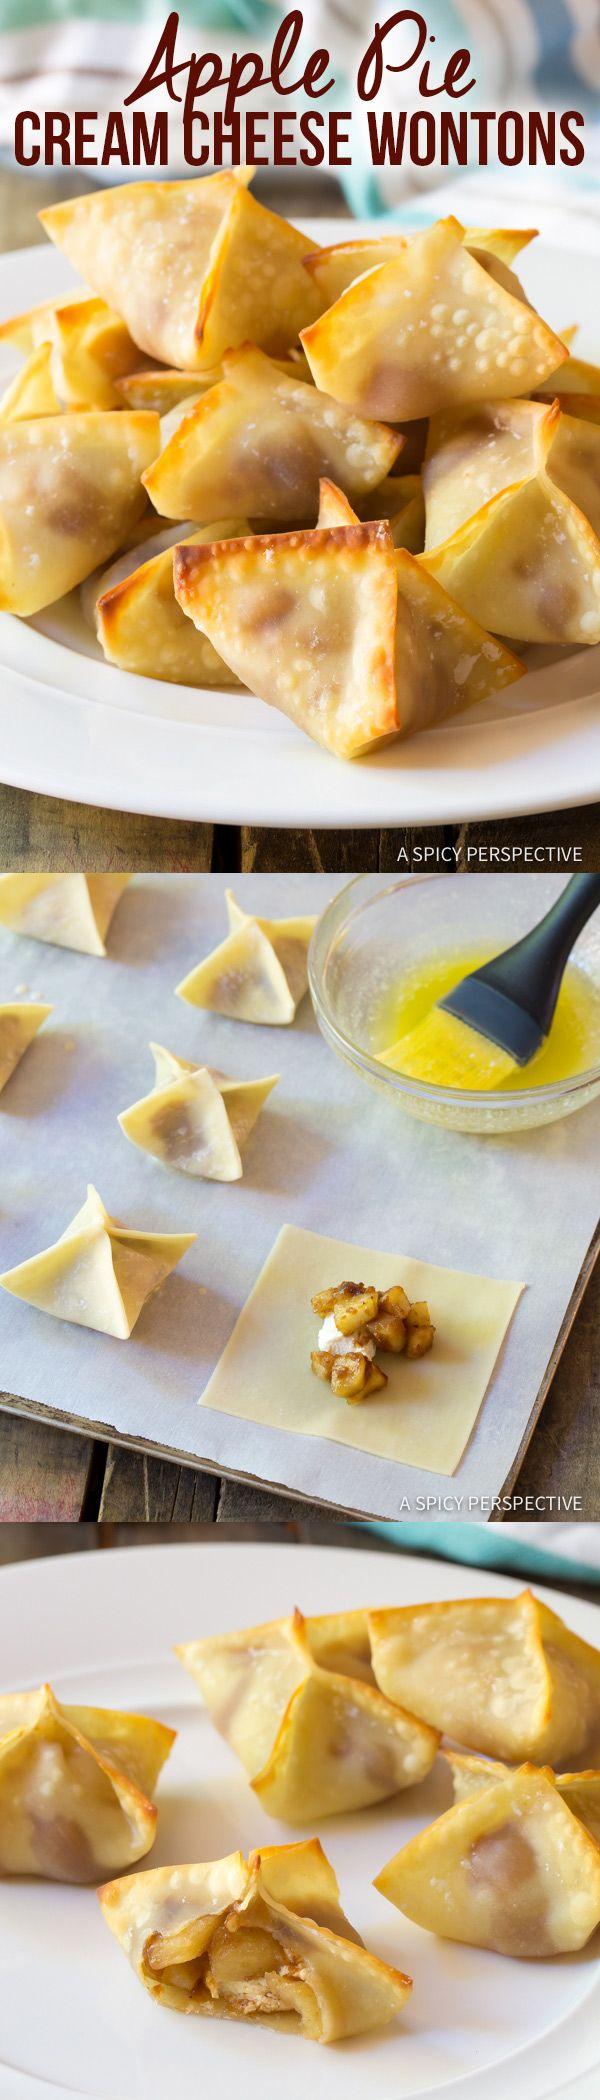 Easy 5-Ingredient Apple Pie Cream Cheese Wontons   ASpicyPerspective.com